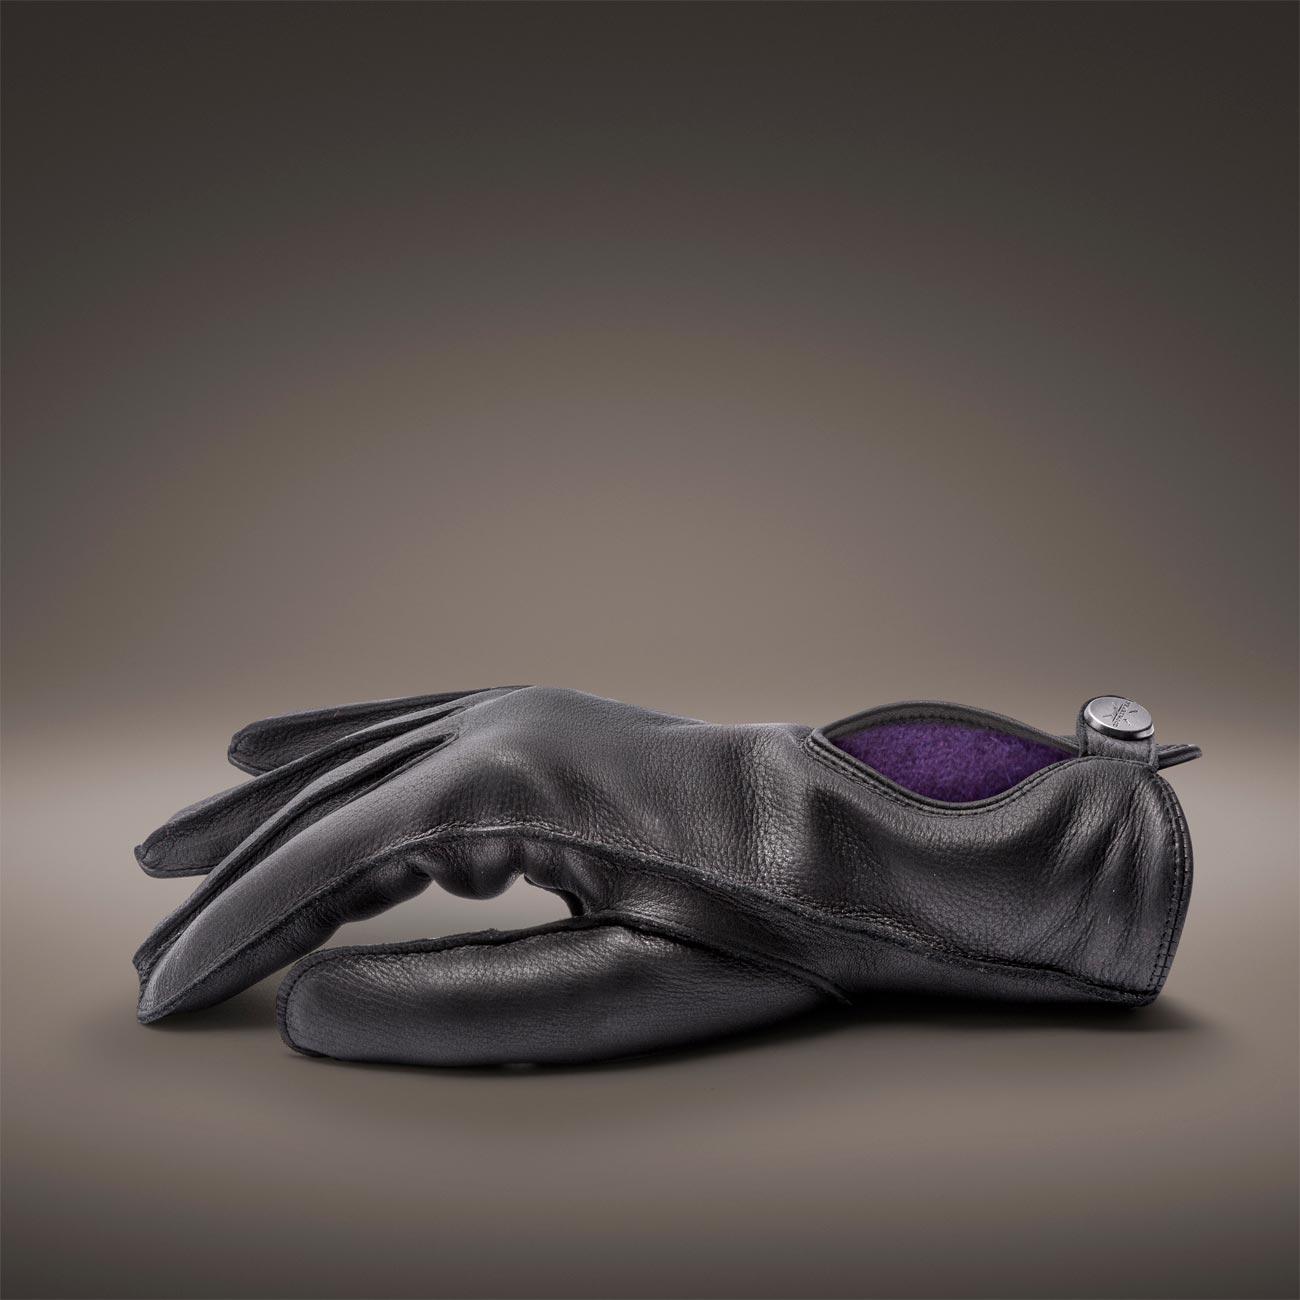 Exclusive Handschuhe Produzent | Hersteller hochwertiger Leder Handschuhe